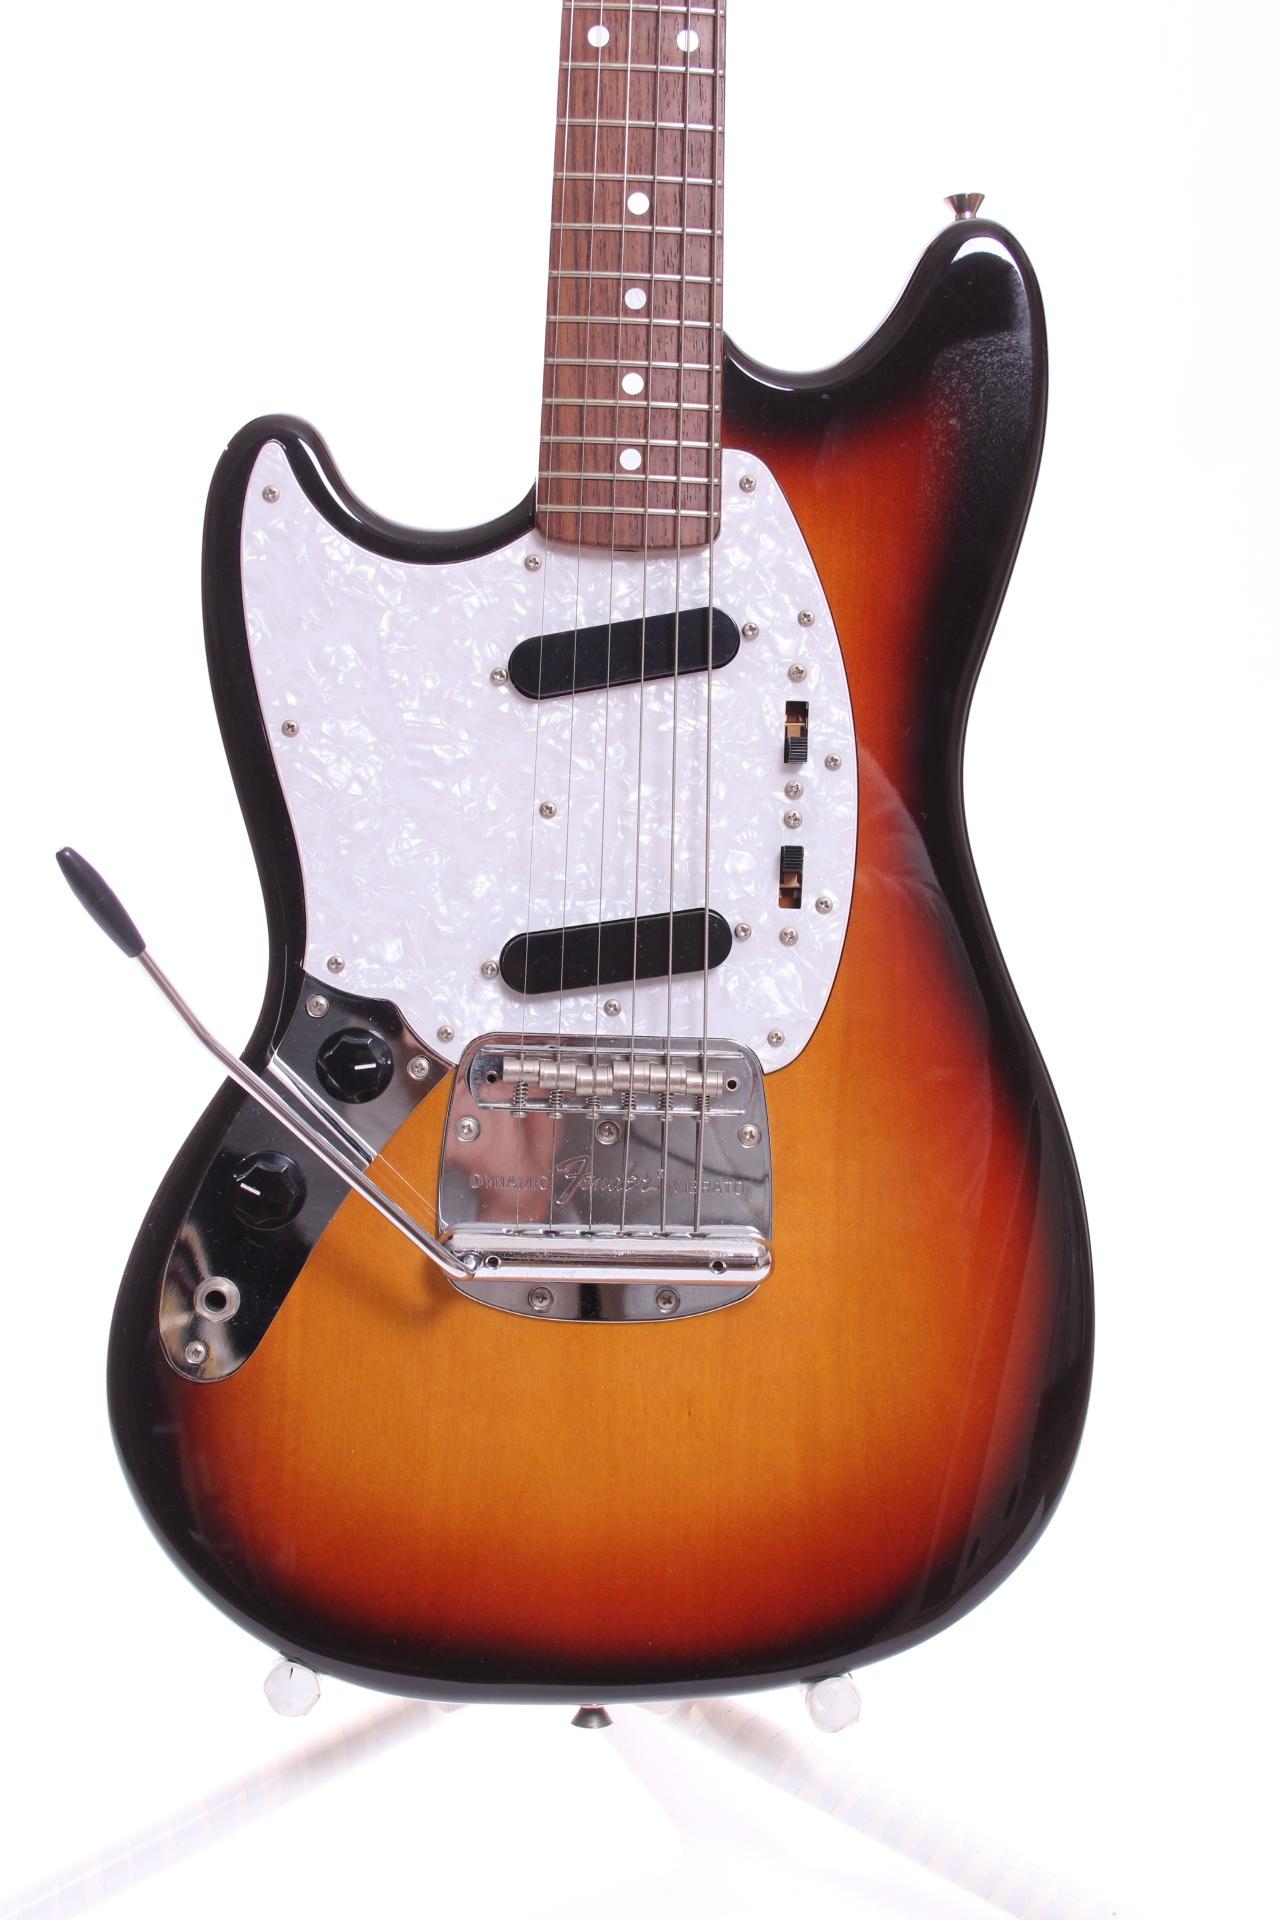 fender mustang 39 65 reissue 2008 three tone sunburst guitar for sale yeahman 39 s guitars. Black Bedroom Furniture Sets. Home Design Ideas